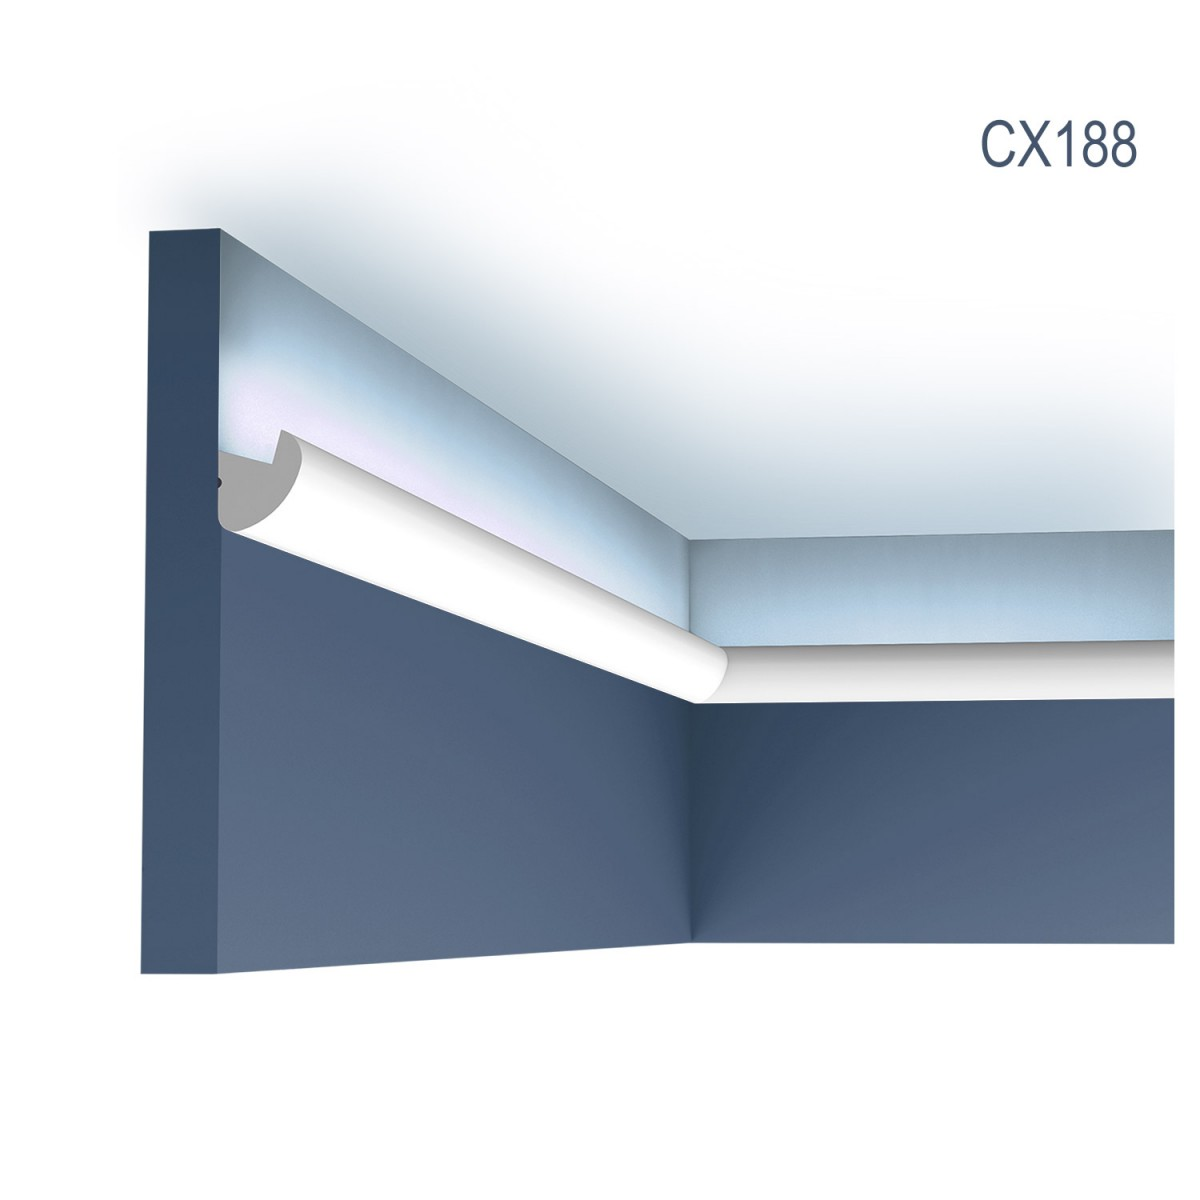 Cornisa Axxent CX188, Dimensiuni: 200 X 3 X 3.4 cm, Orac Decor